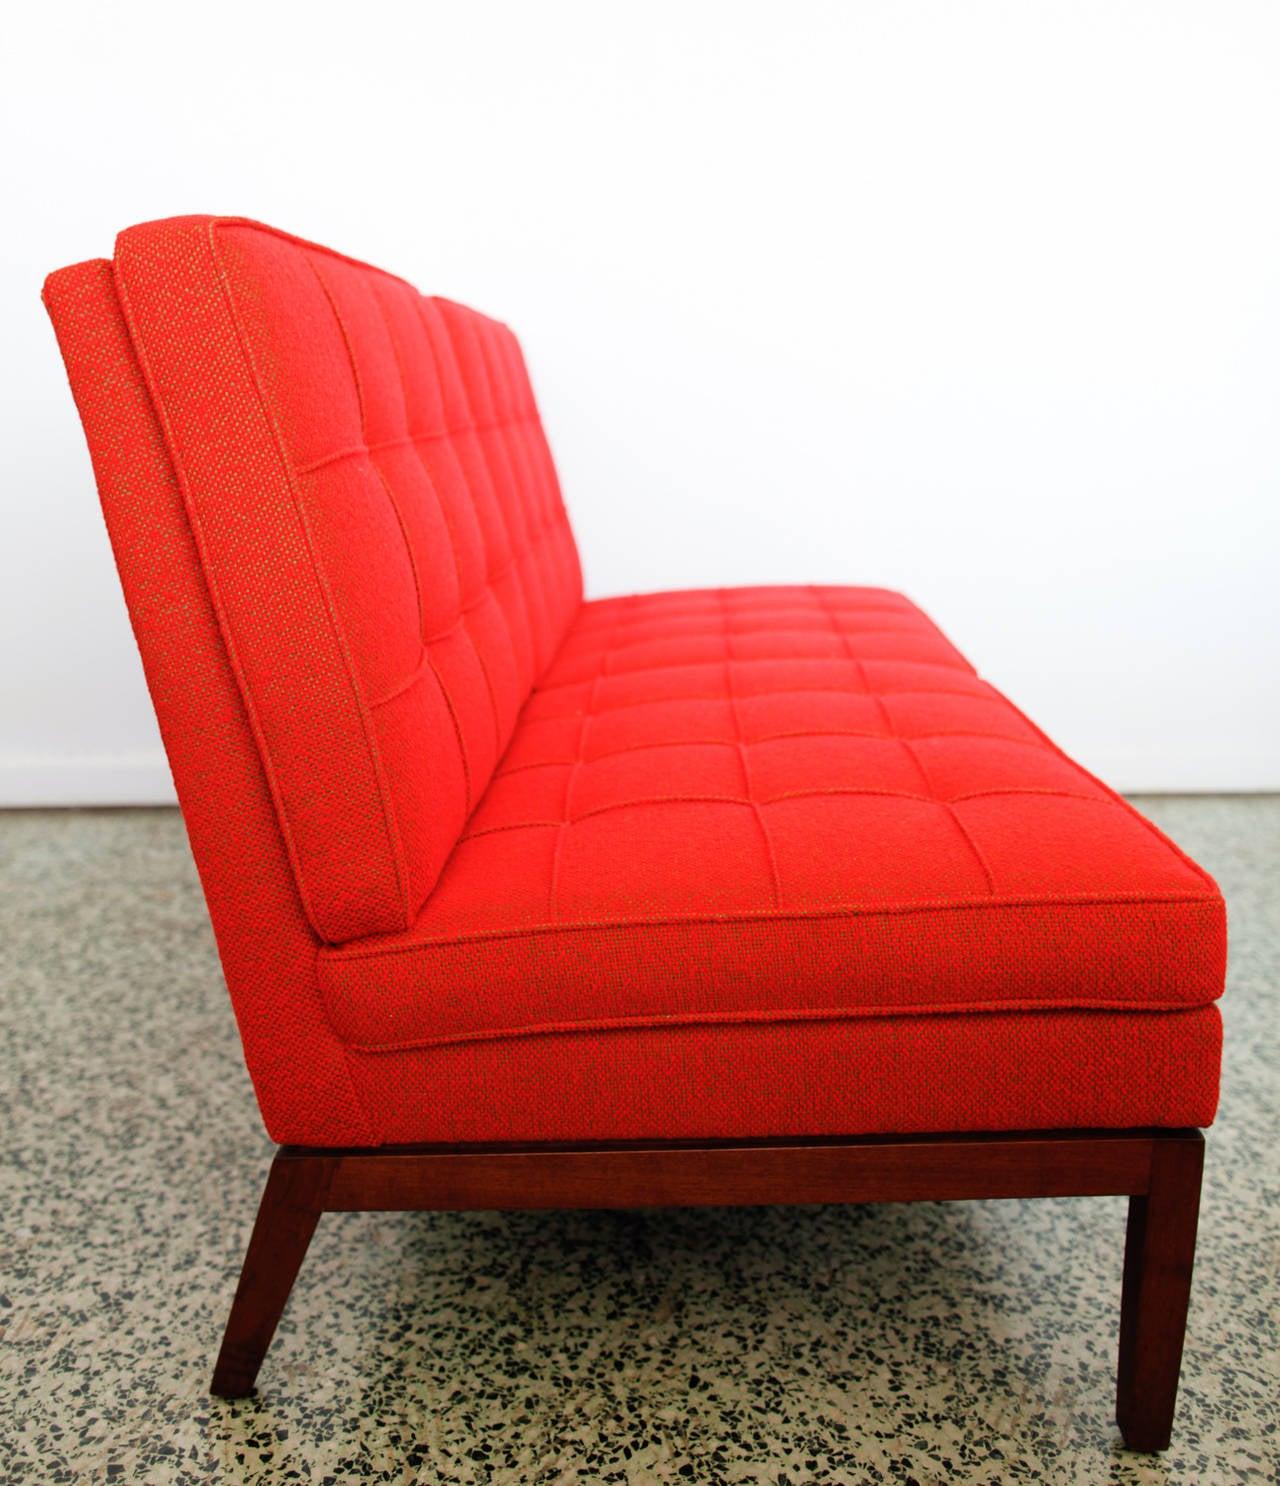 florence knoll for knoll sofa at 1stdibs. Black Bedroom Furniture Sets. Home Design Ideas